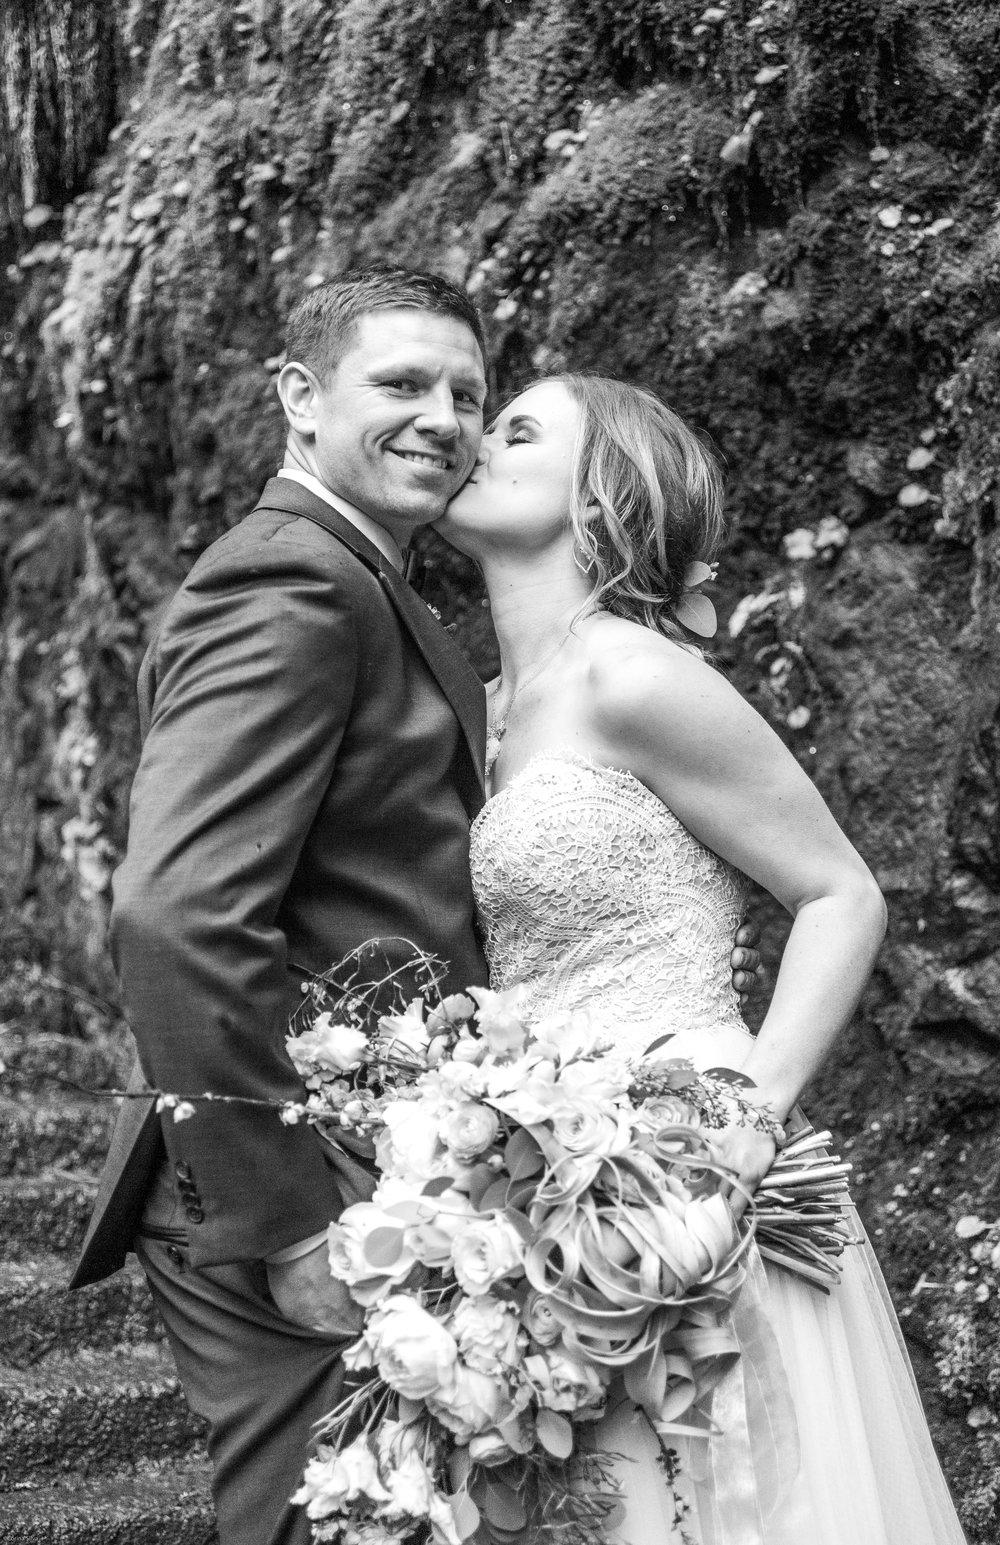 Silver Falls-elopement-bride-and-groom-photo Corina Silva Studios-188.jpg